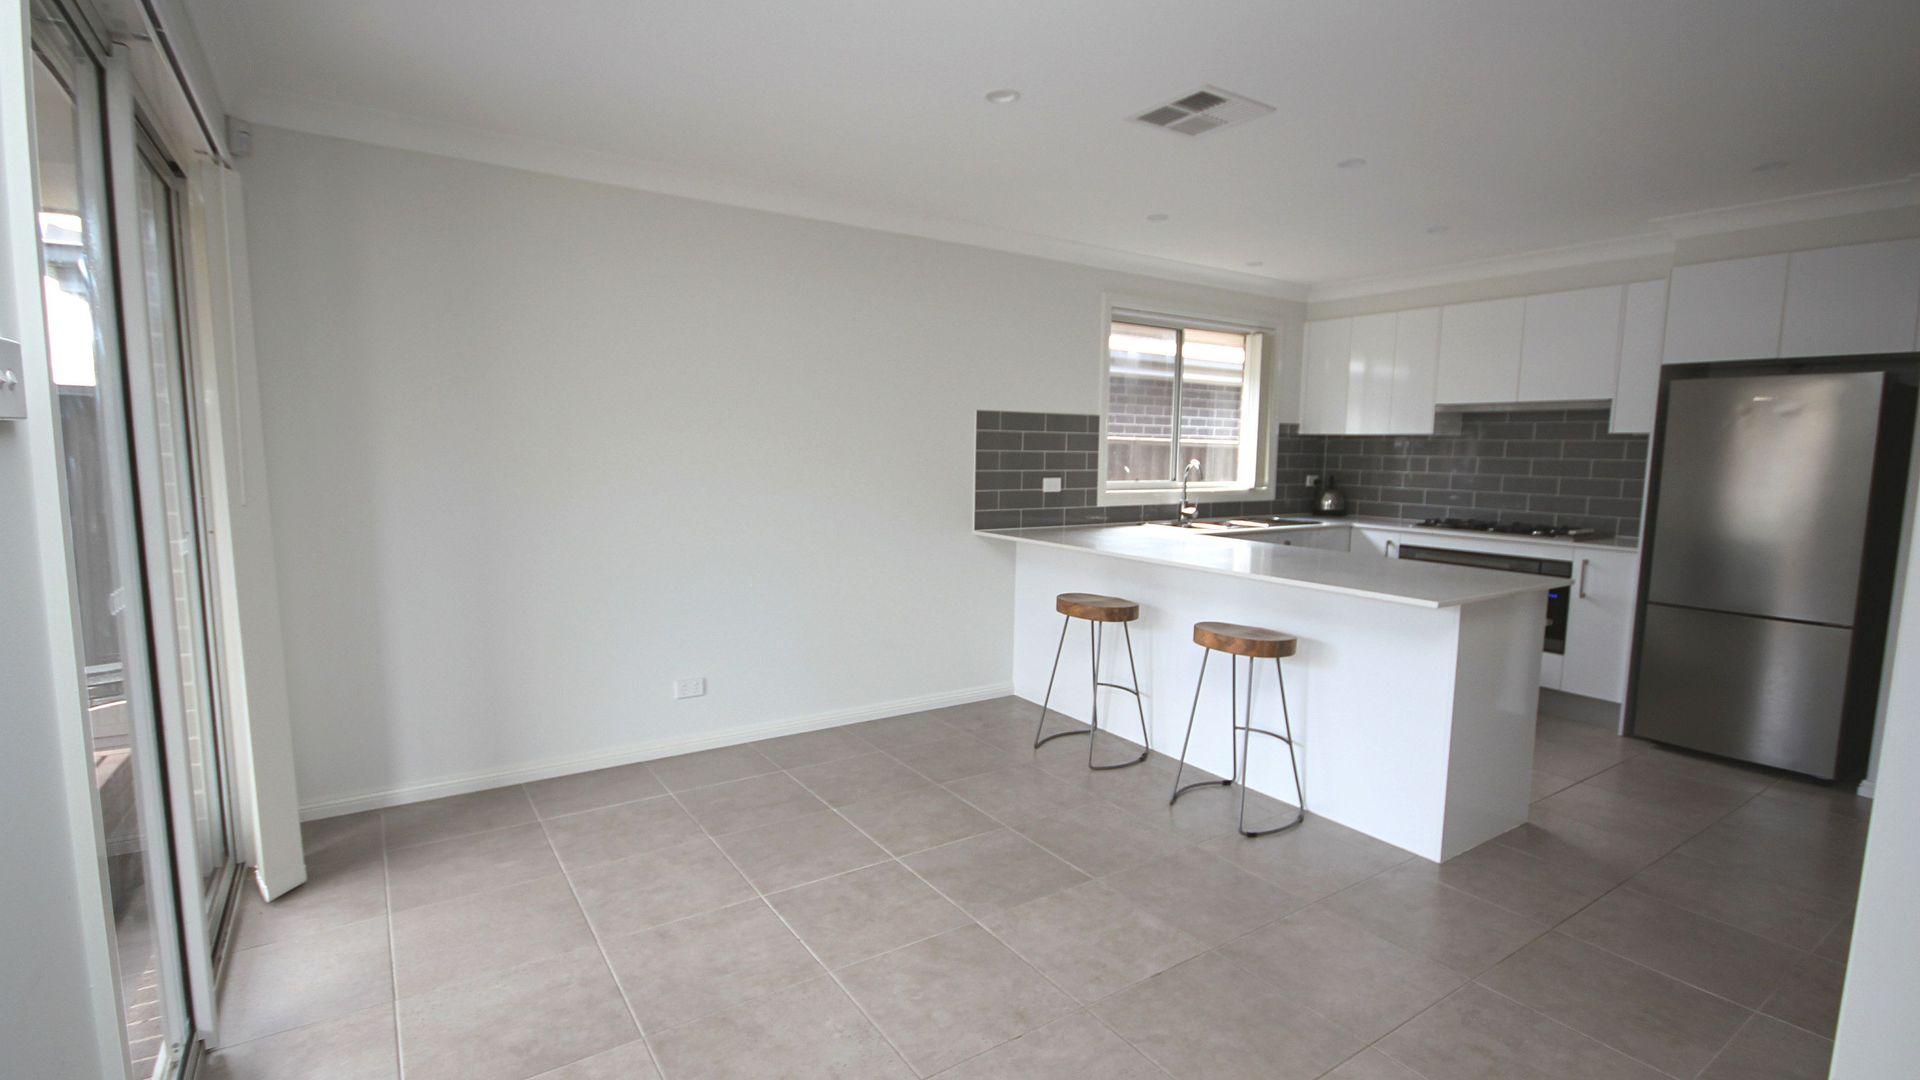 10 Cilento Street, Spring Farm NSW 2570, Image 2